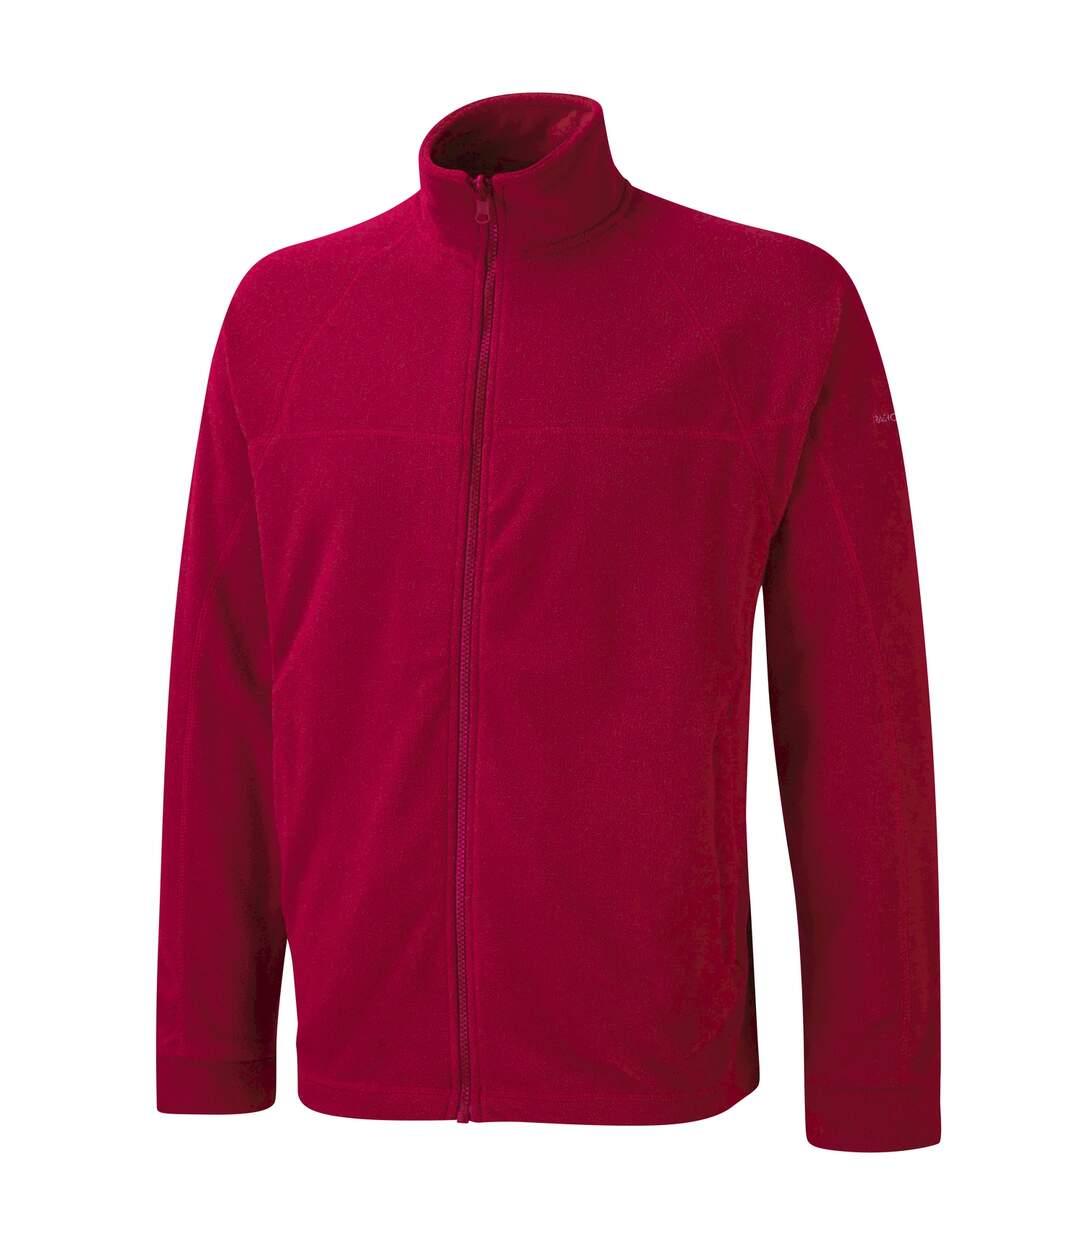 Craghoppers Mens Basecamp Microfleece FZ Full Zip Jacket (Red) - UTRW367